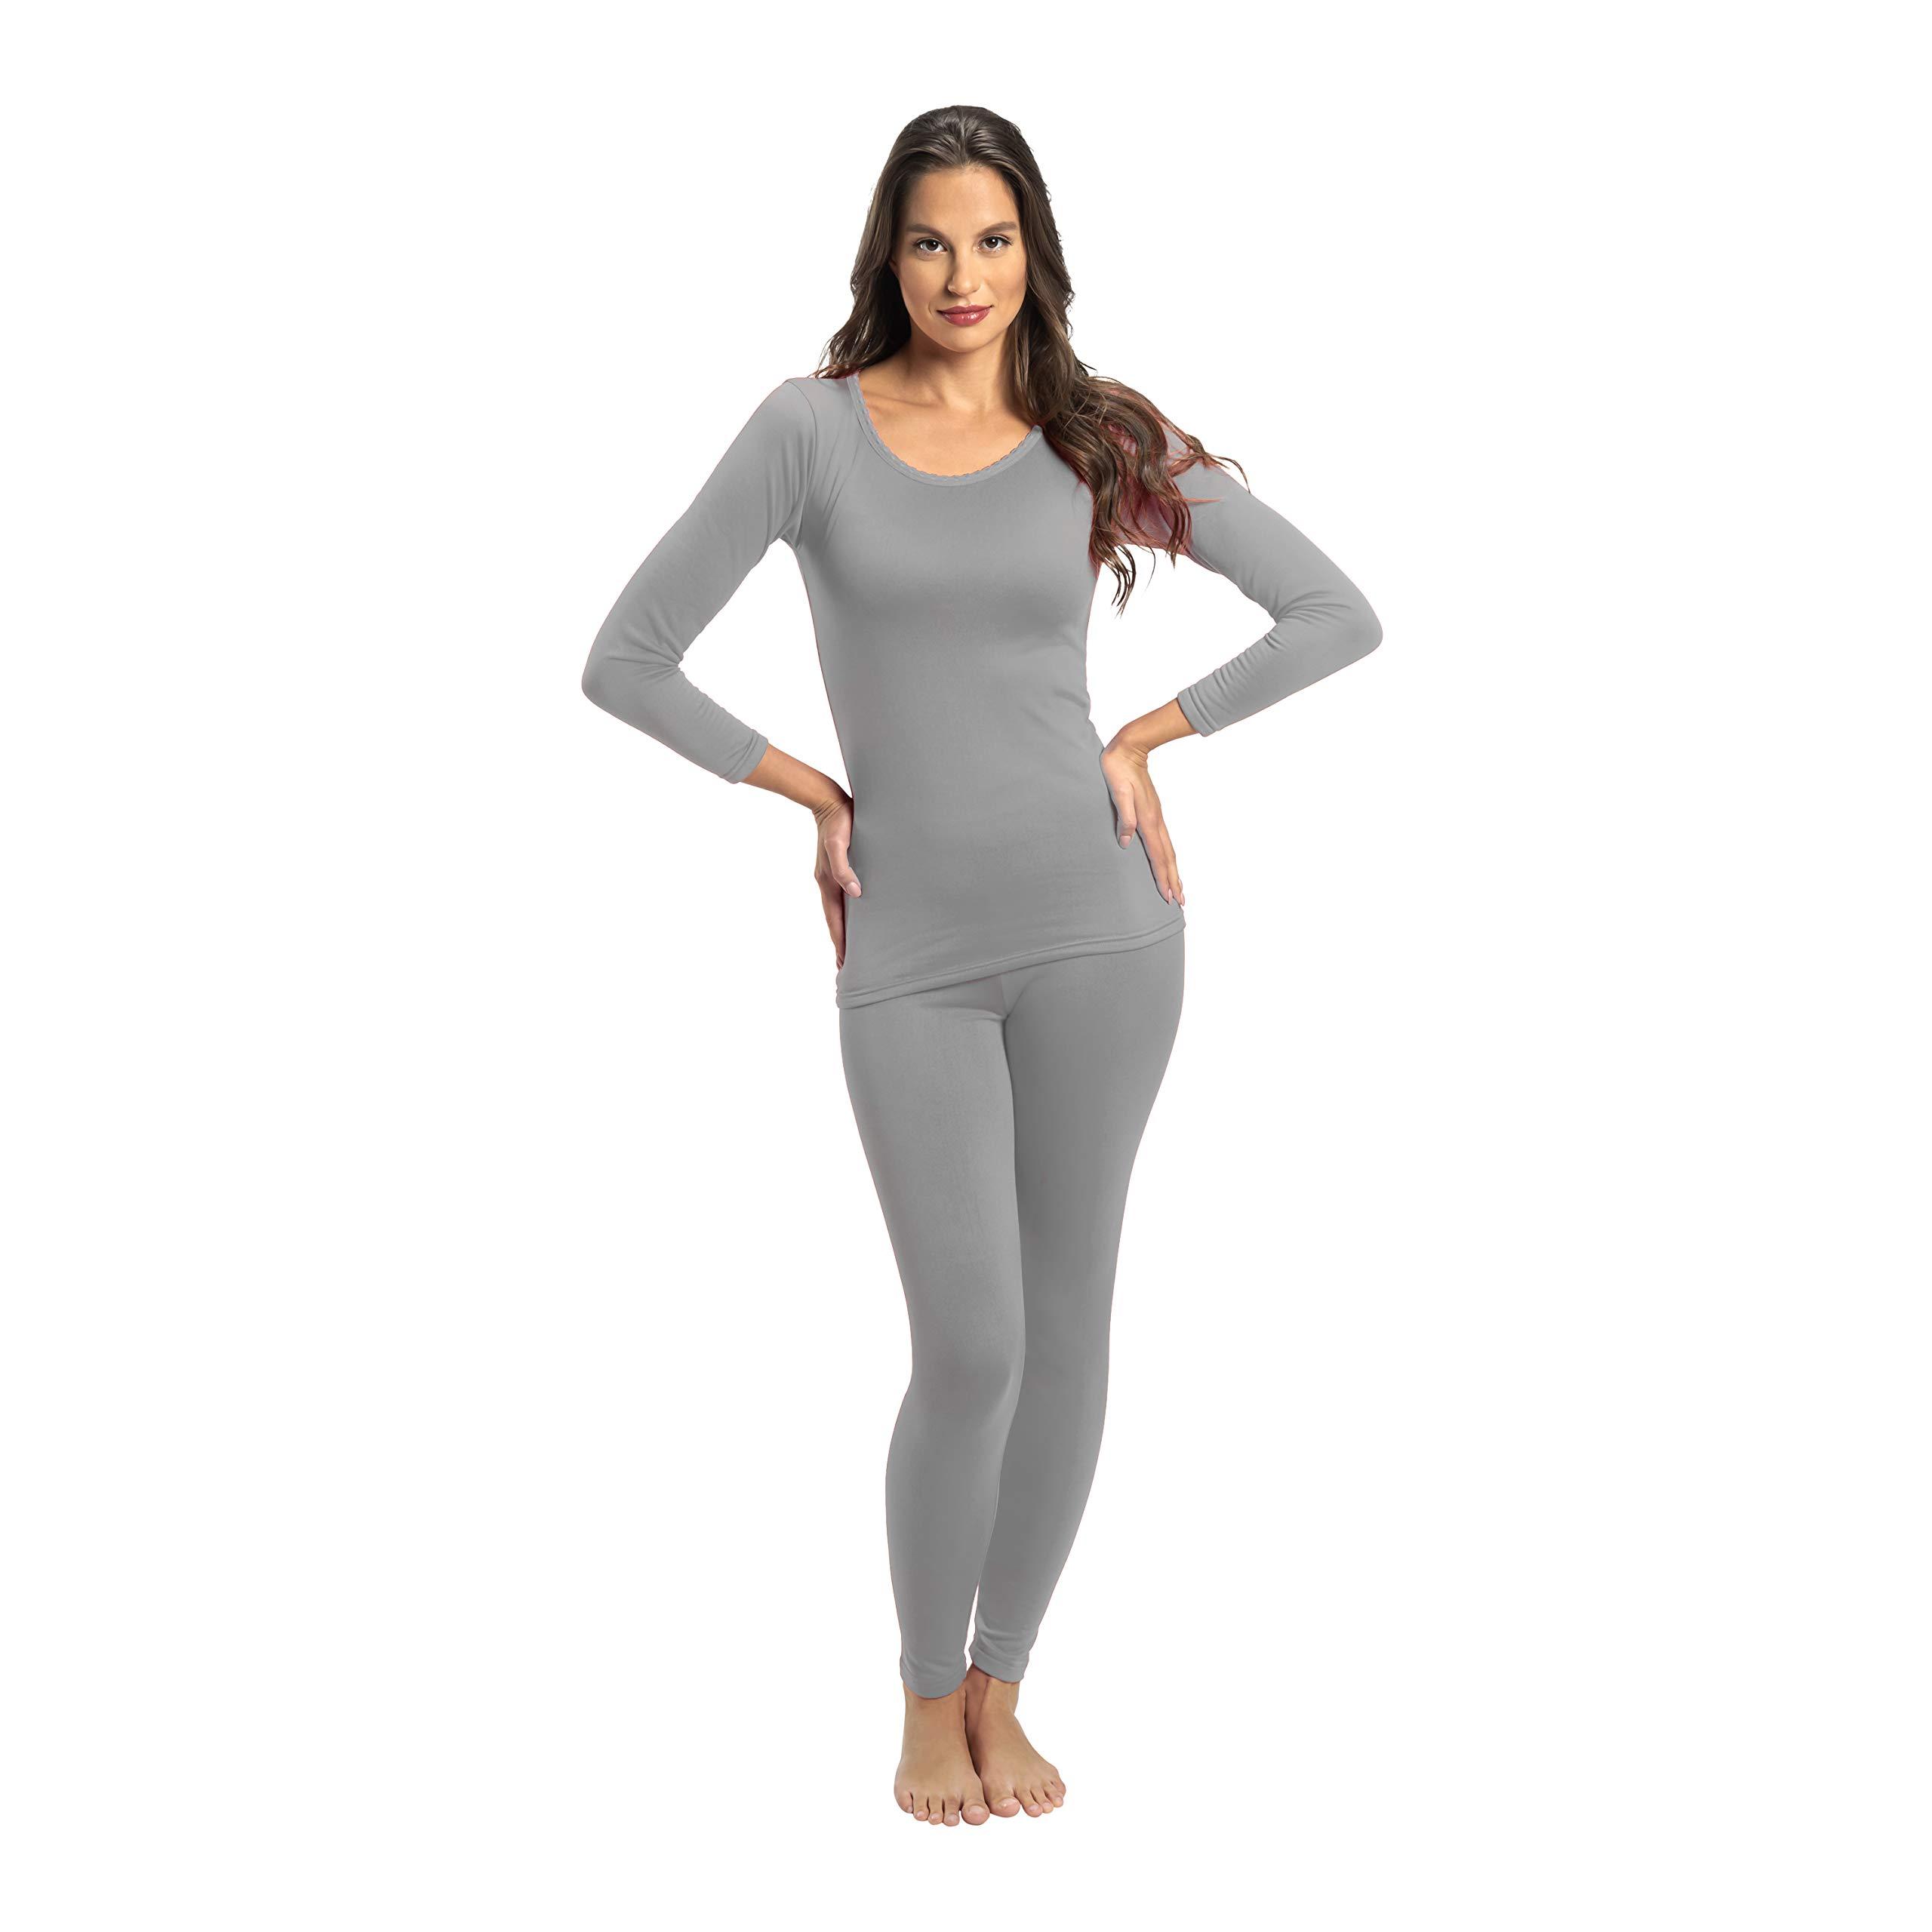 Rocky Thermal Underwear for Women Fleece Lined Thermals Women's Base Layer Long John Set Grey by Rocky